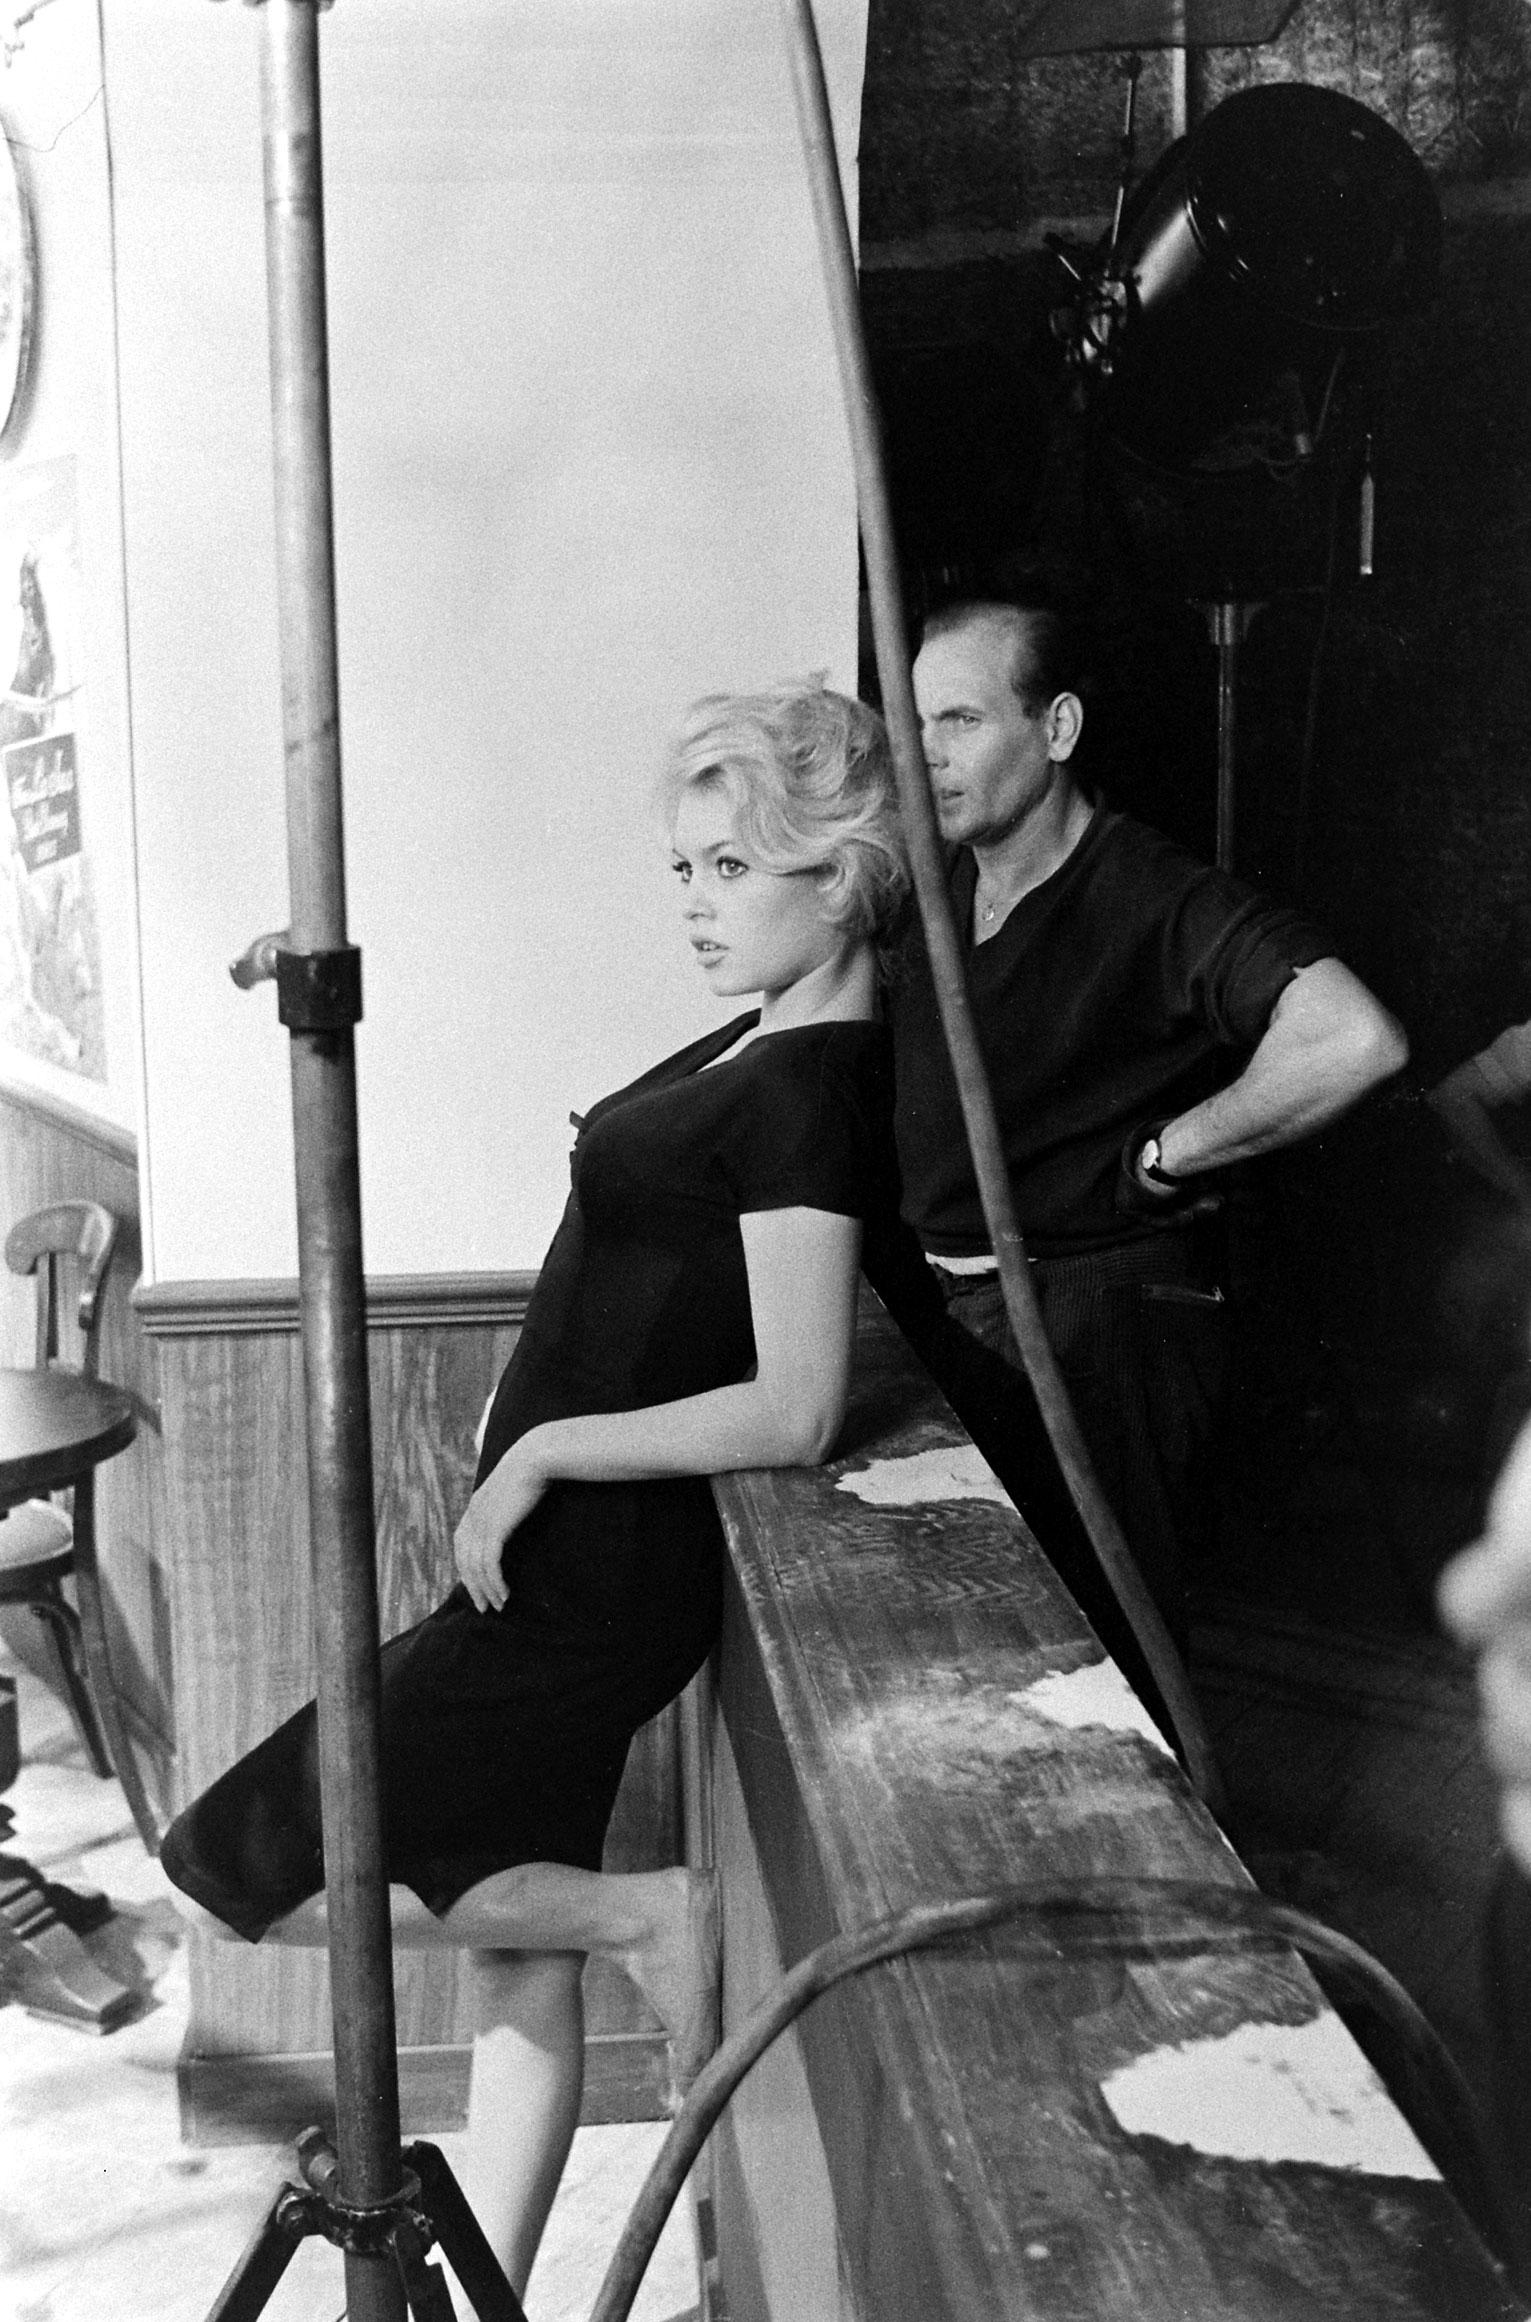 Brigitte Bardot photographed between takes on the set of the film, <i>La Femme et le Pantin</i>, Spain, 1958.